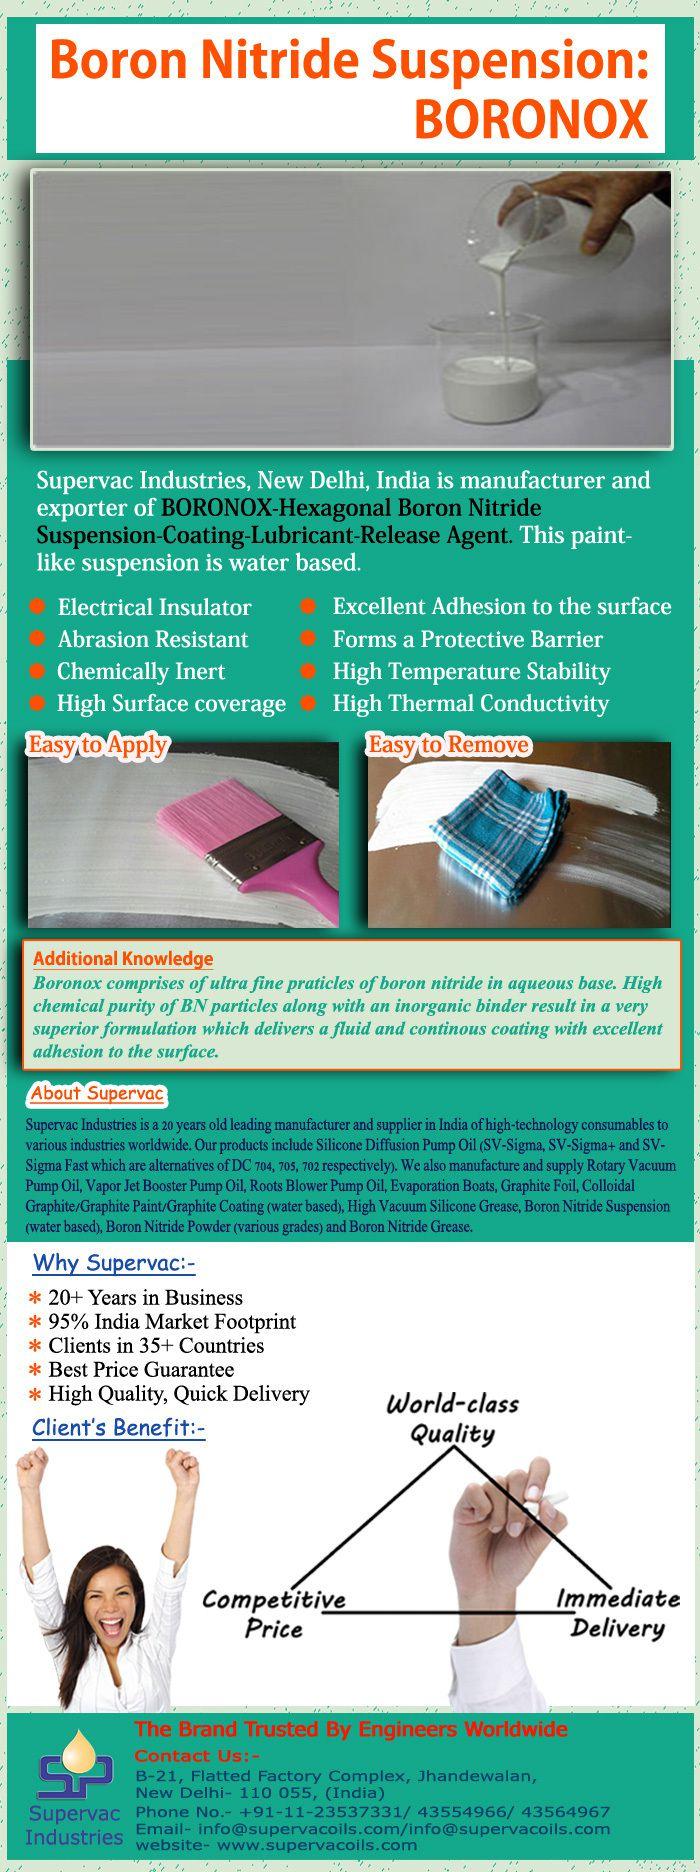 Supervac Industries (@supervacindustries) - LockerDome